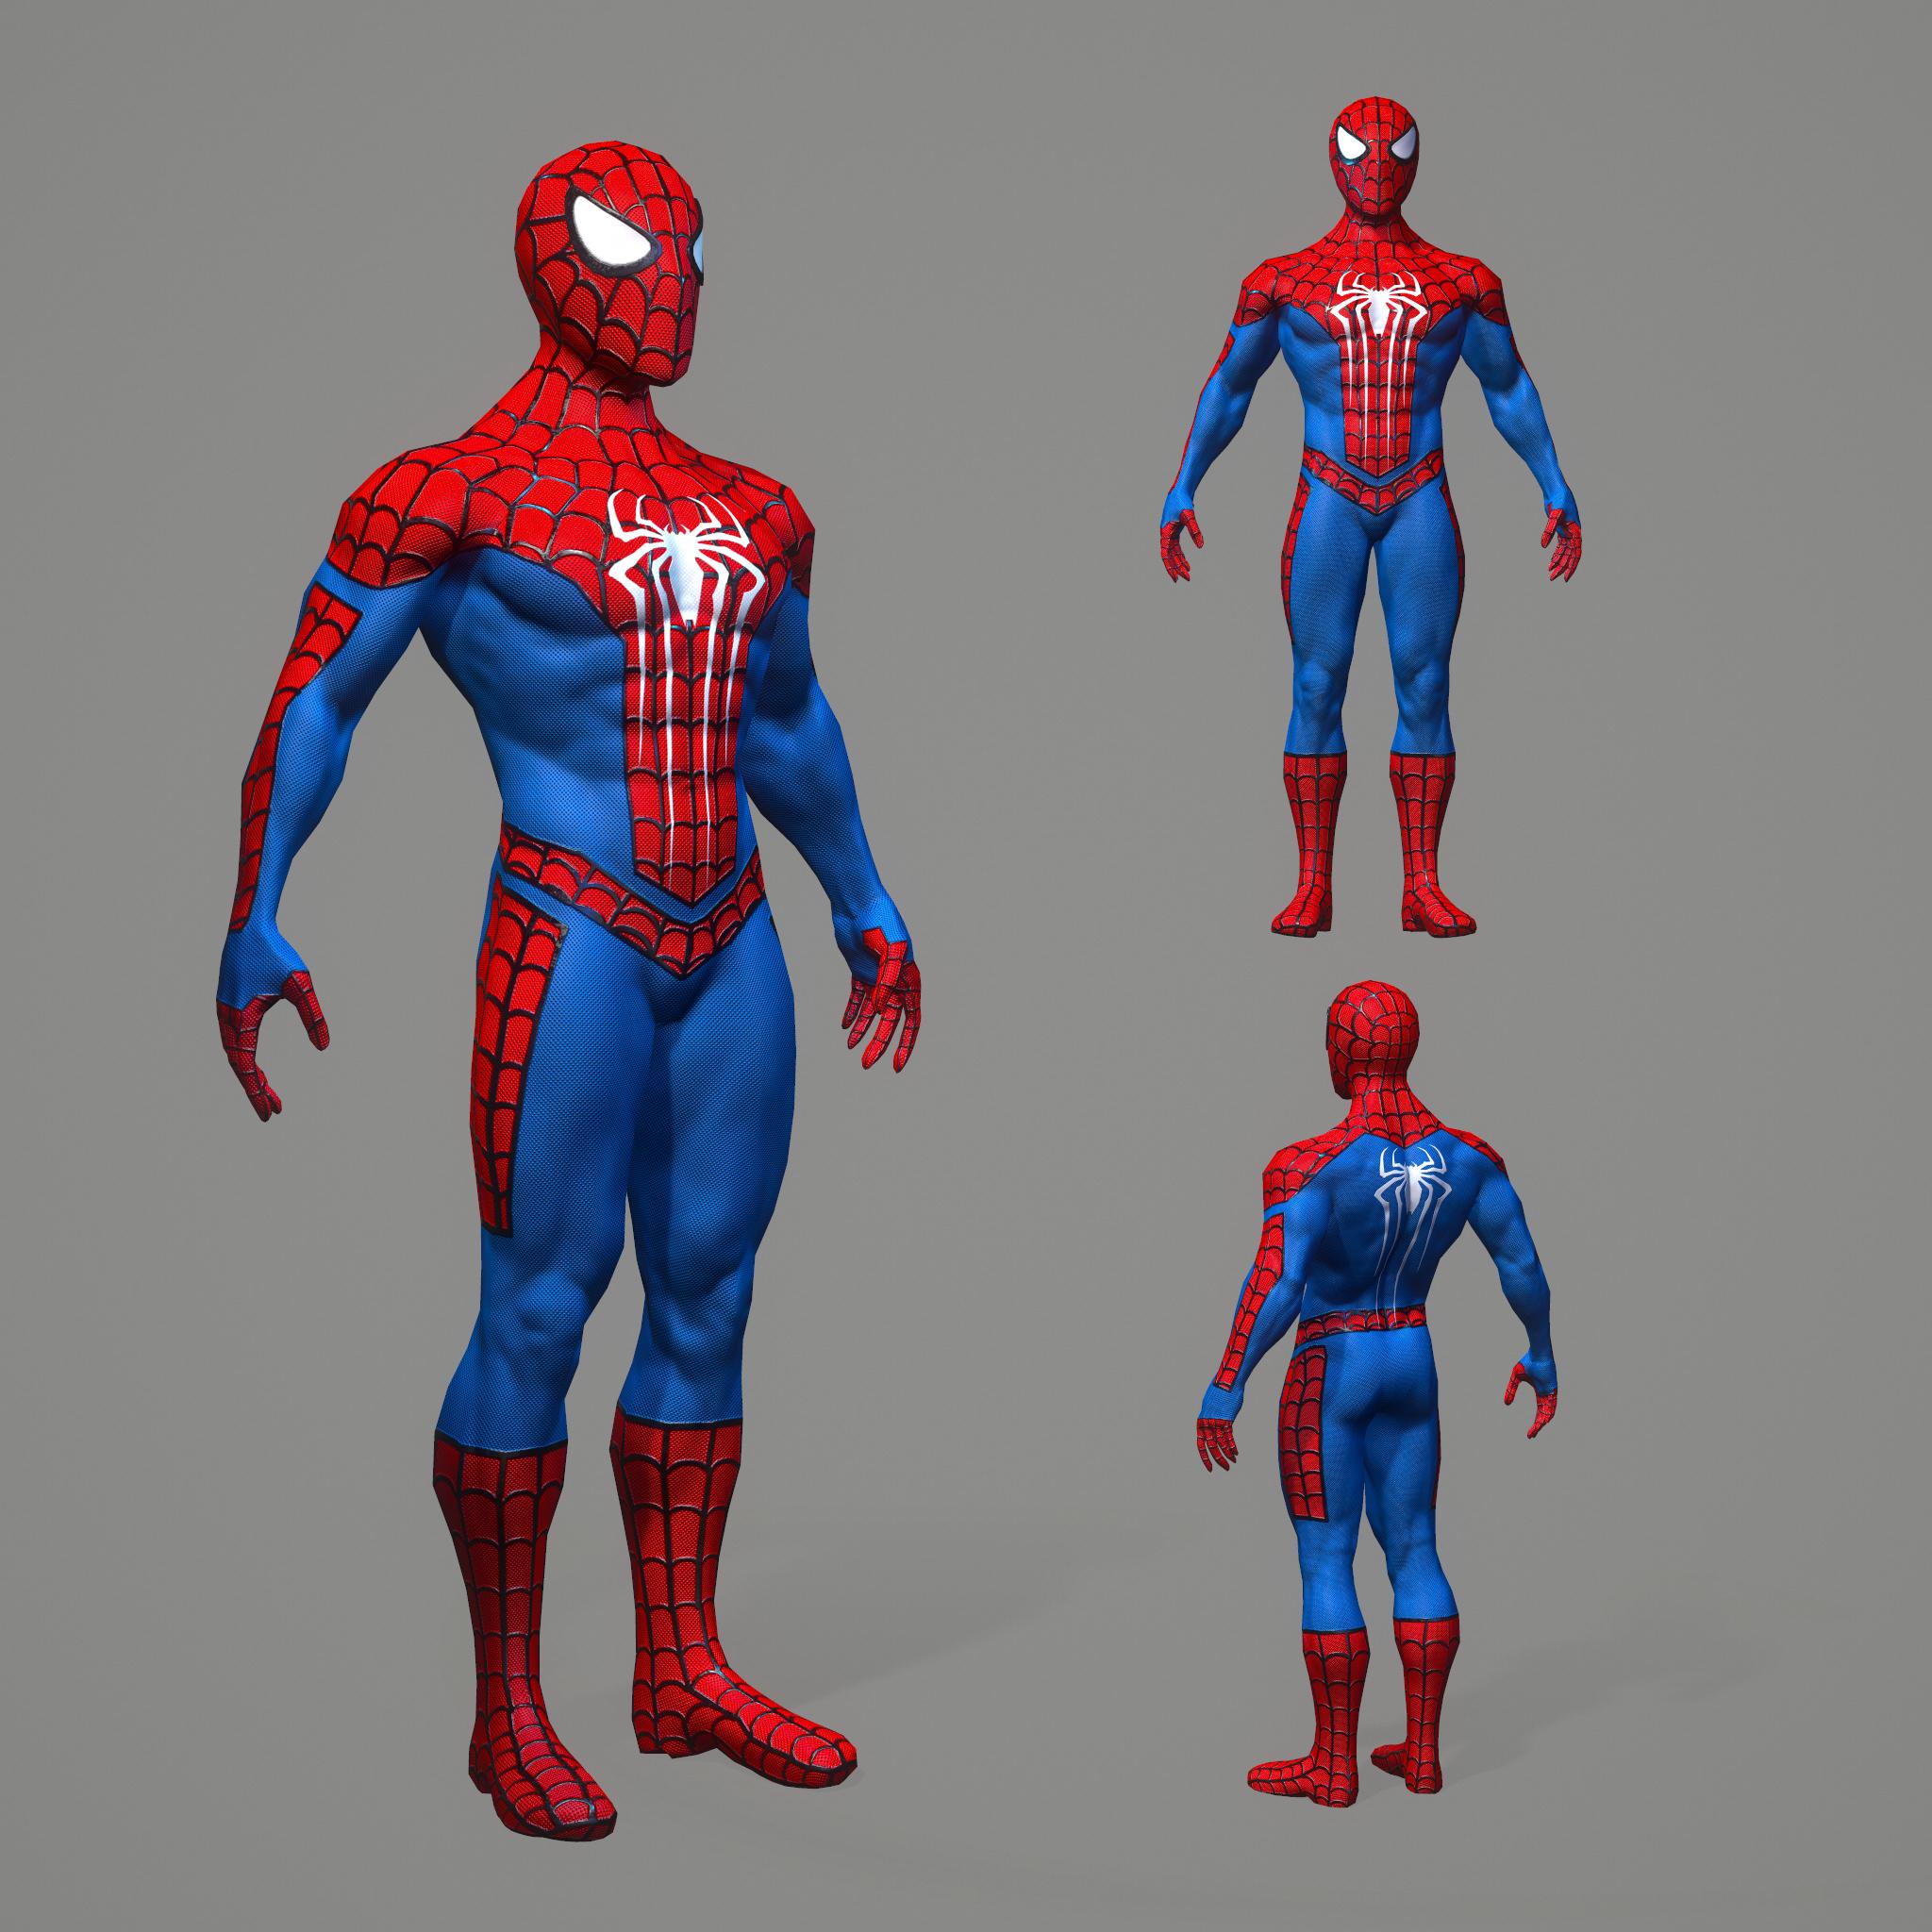 Pbr Spiderman 3d Model Turbosquid 1440779